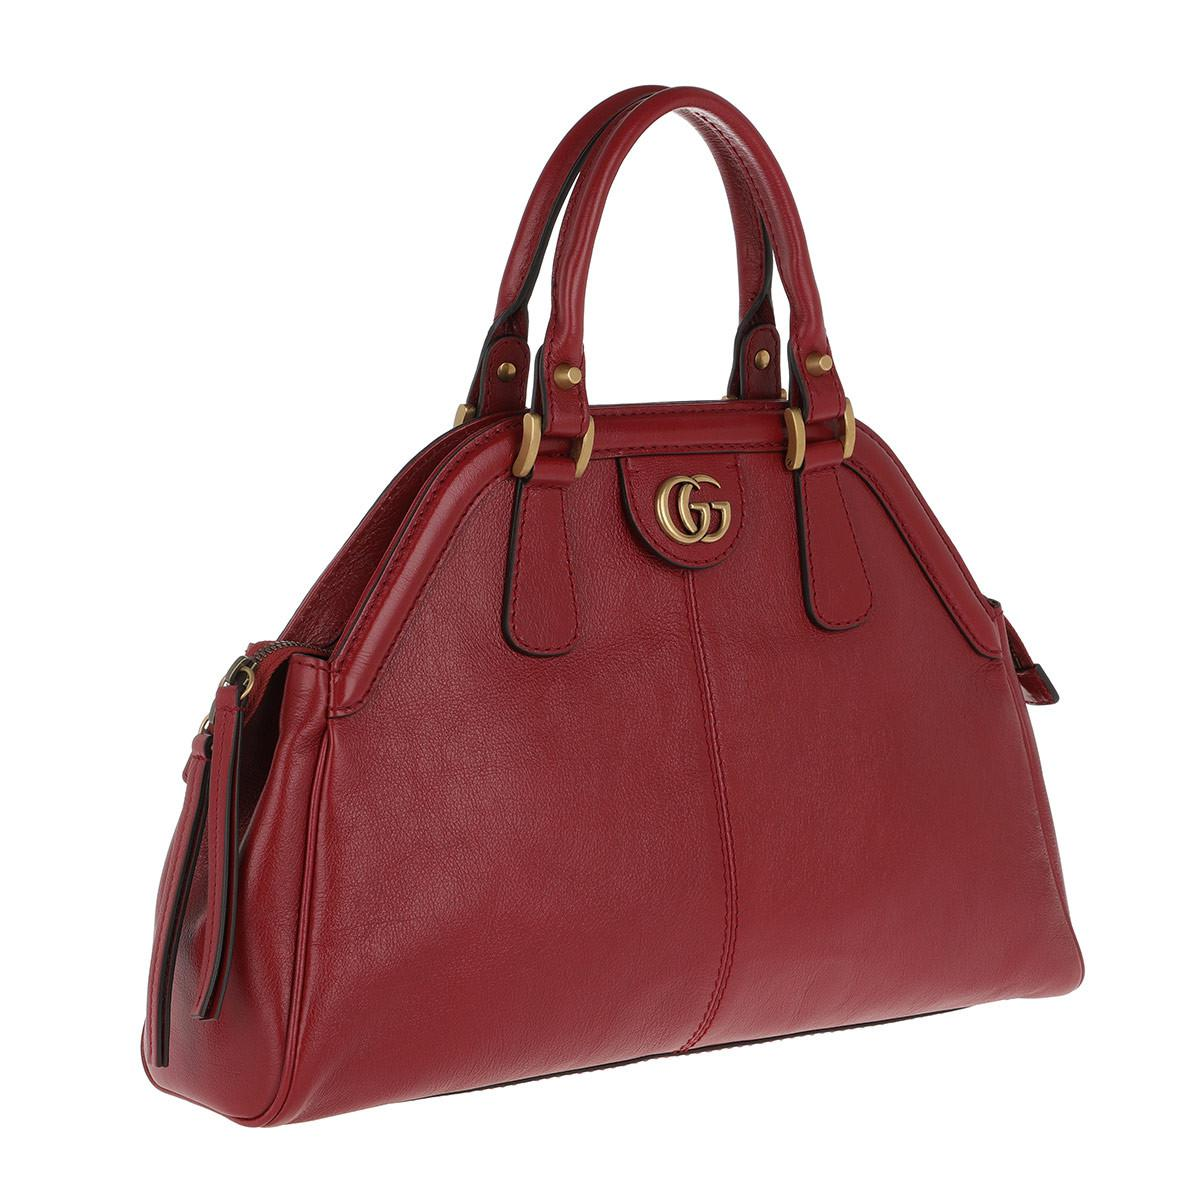 db8da2d158b7 Gucci Rebelle Medium Top Handle Bag Red in Red - Lyst